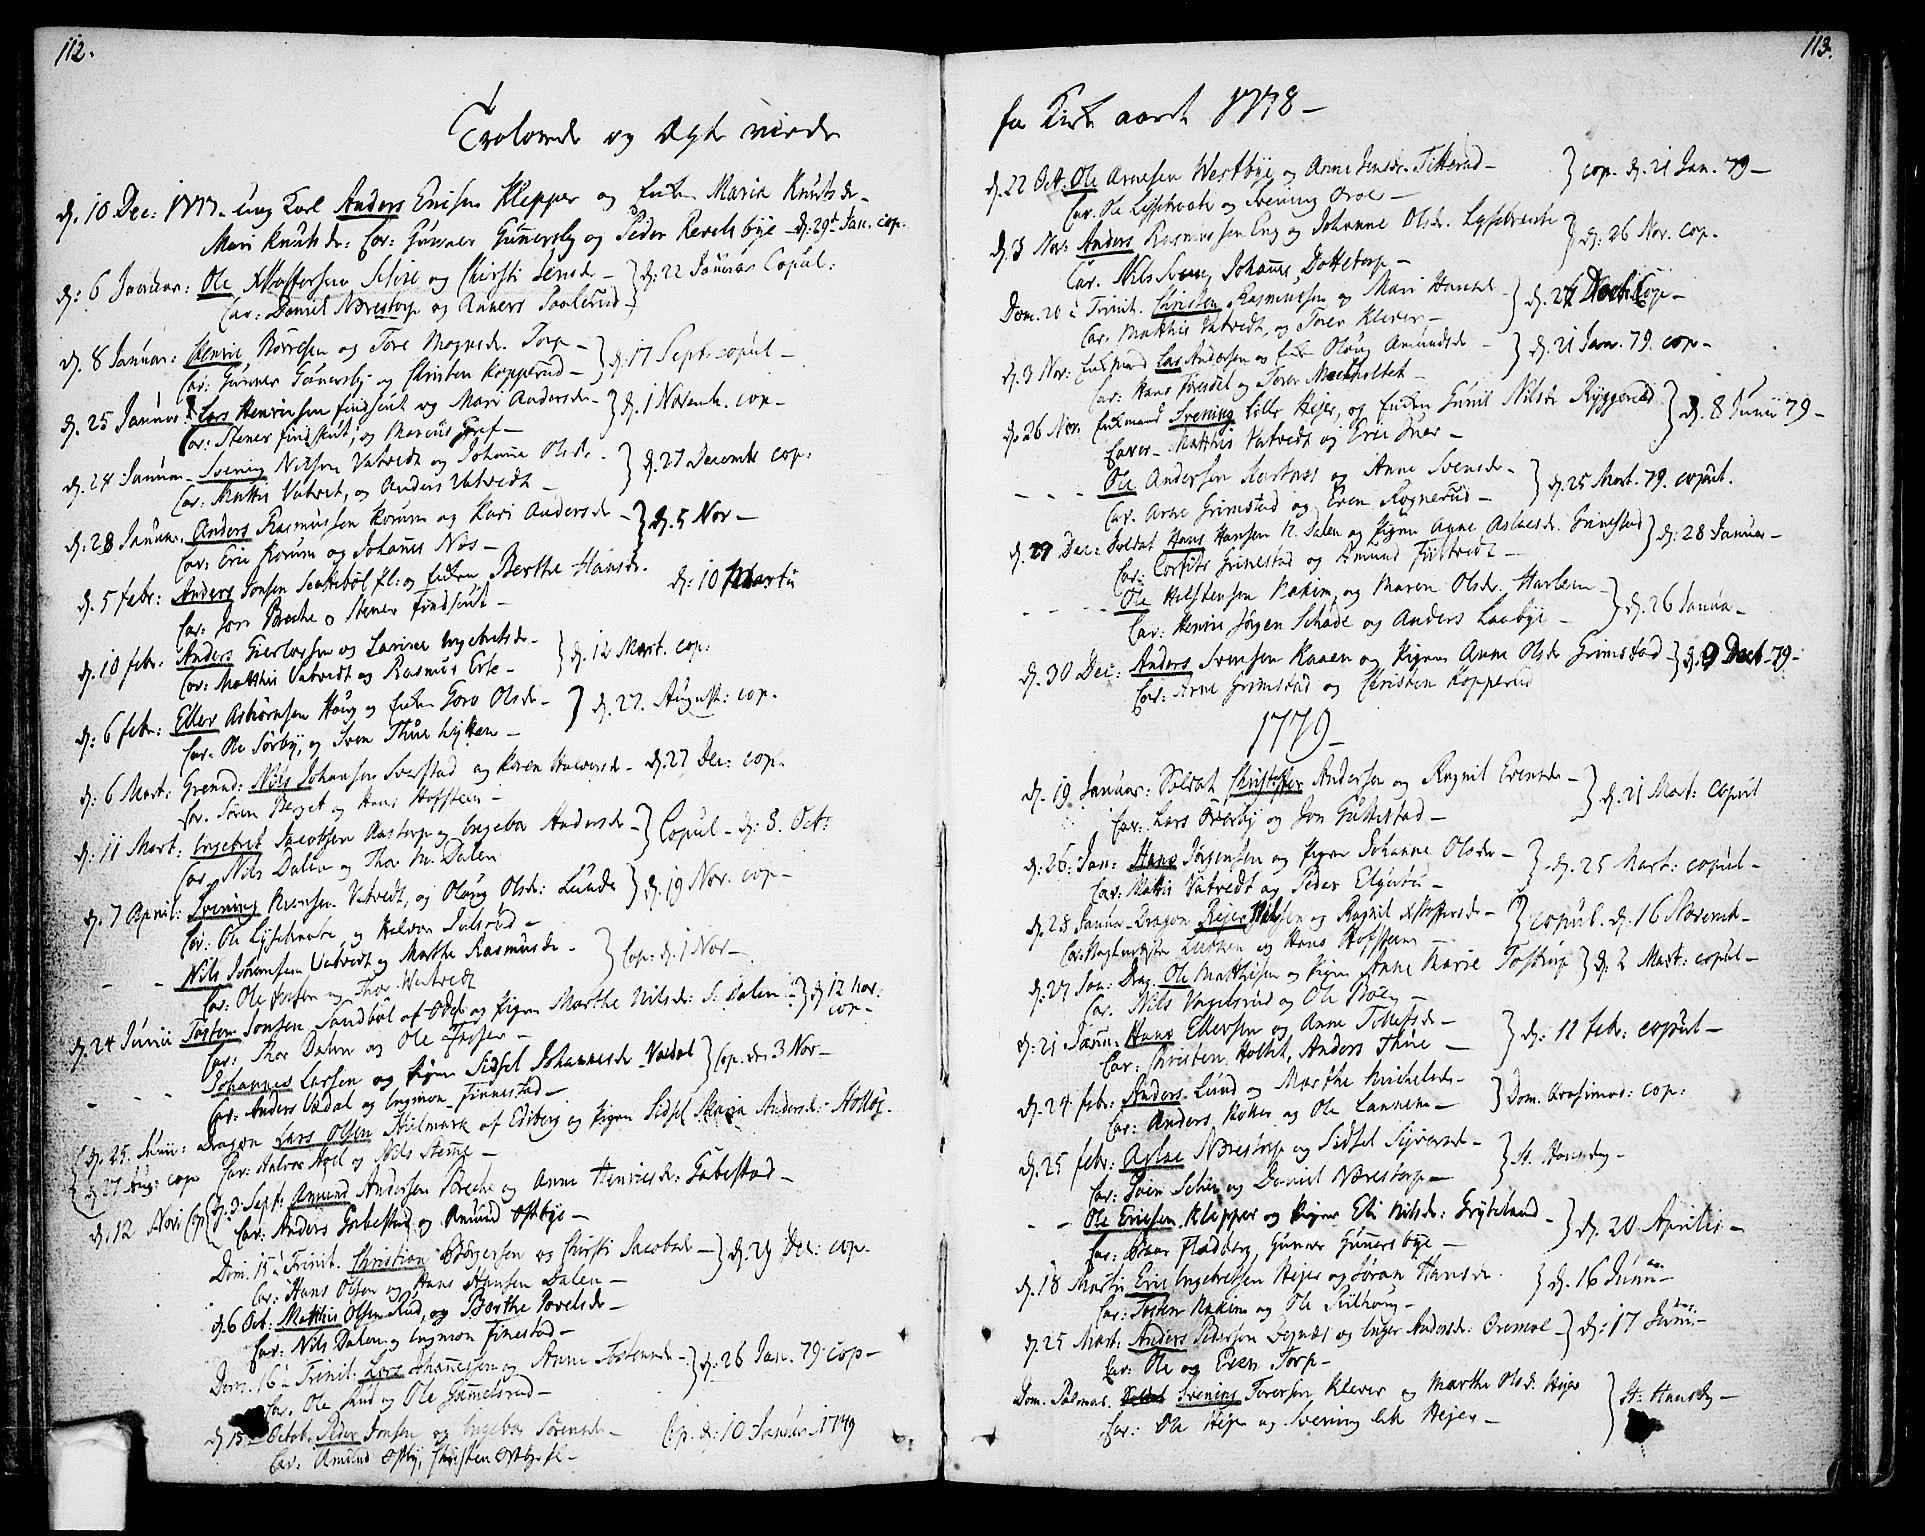 SAO, Rakkestad prestekontor Kirkebøker, F/Fa/L0004: Ministerialbok nr. I 4, 1777-1783, s. 112-113